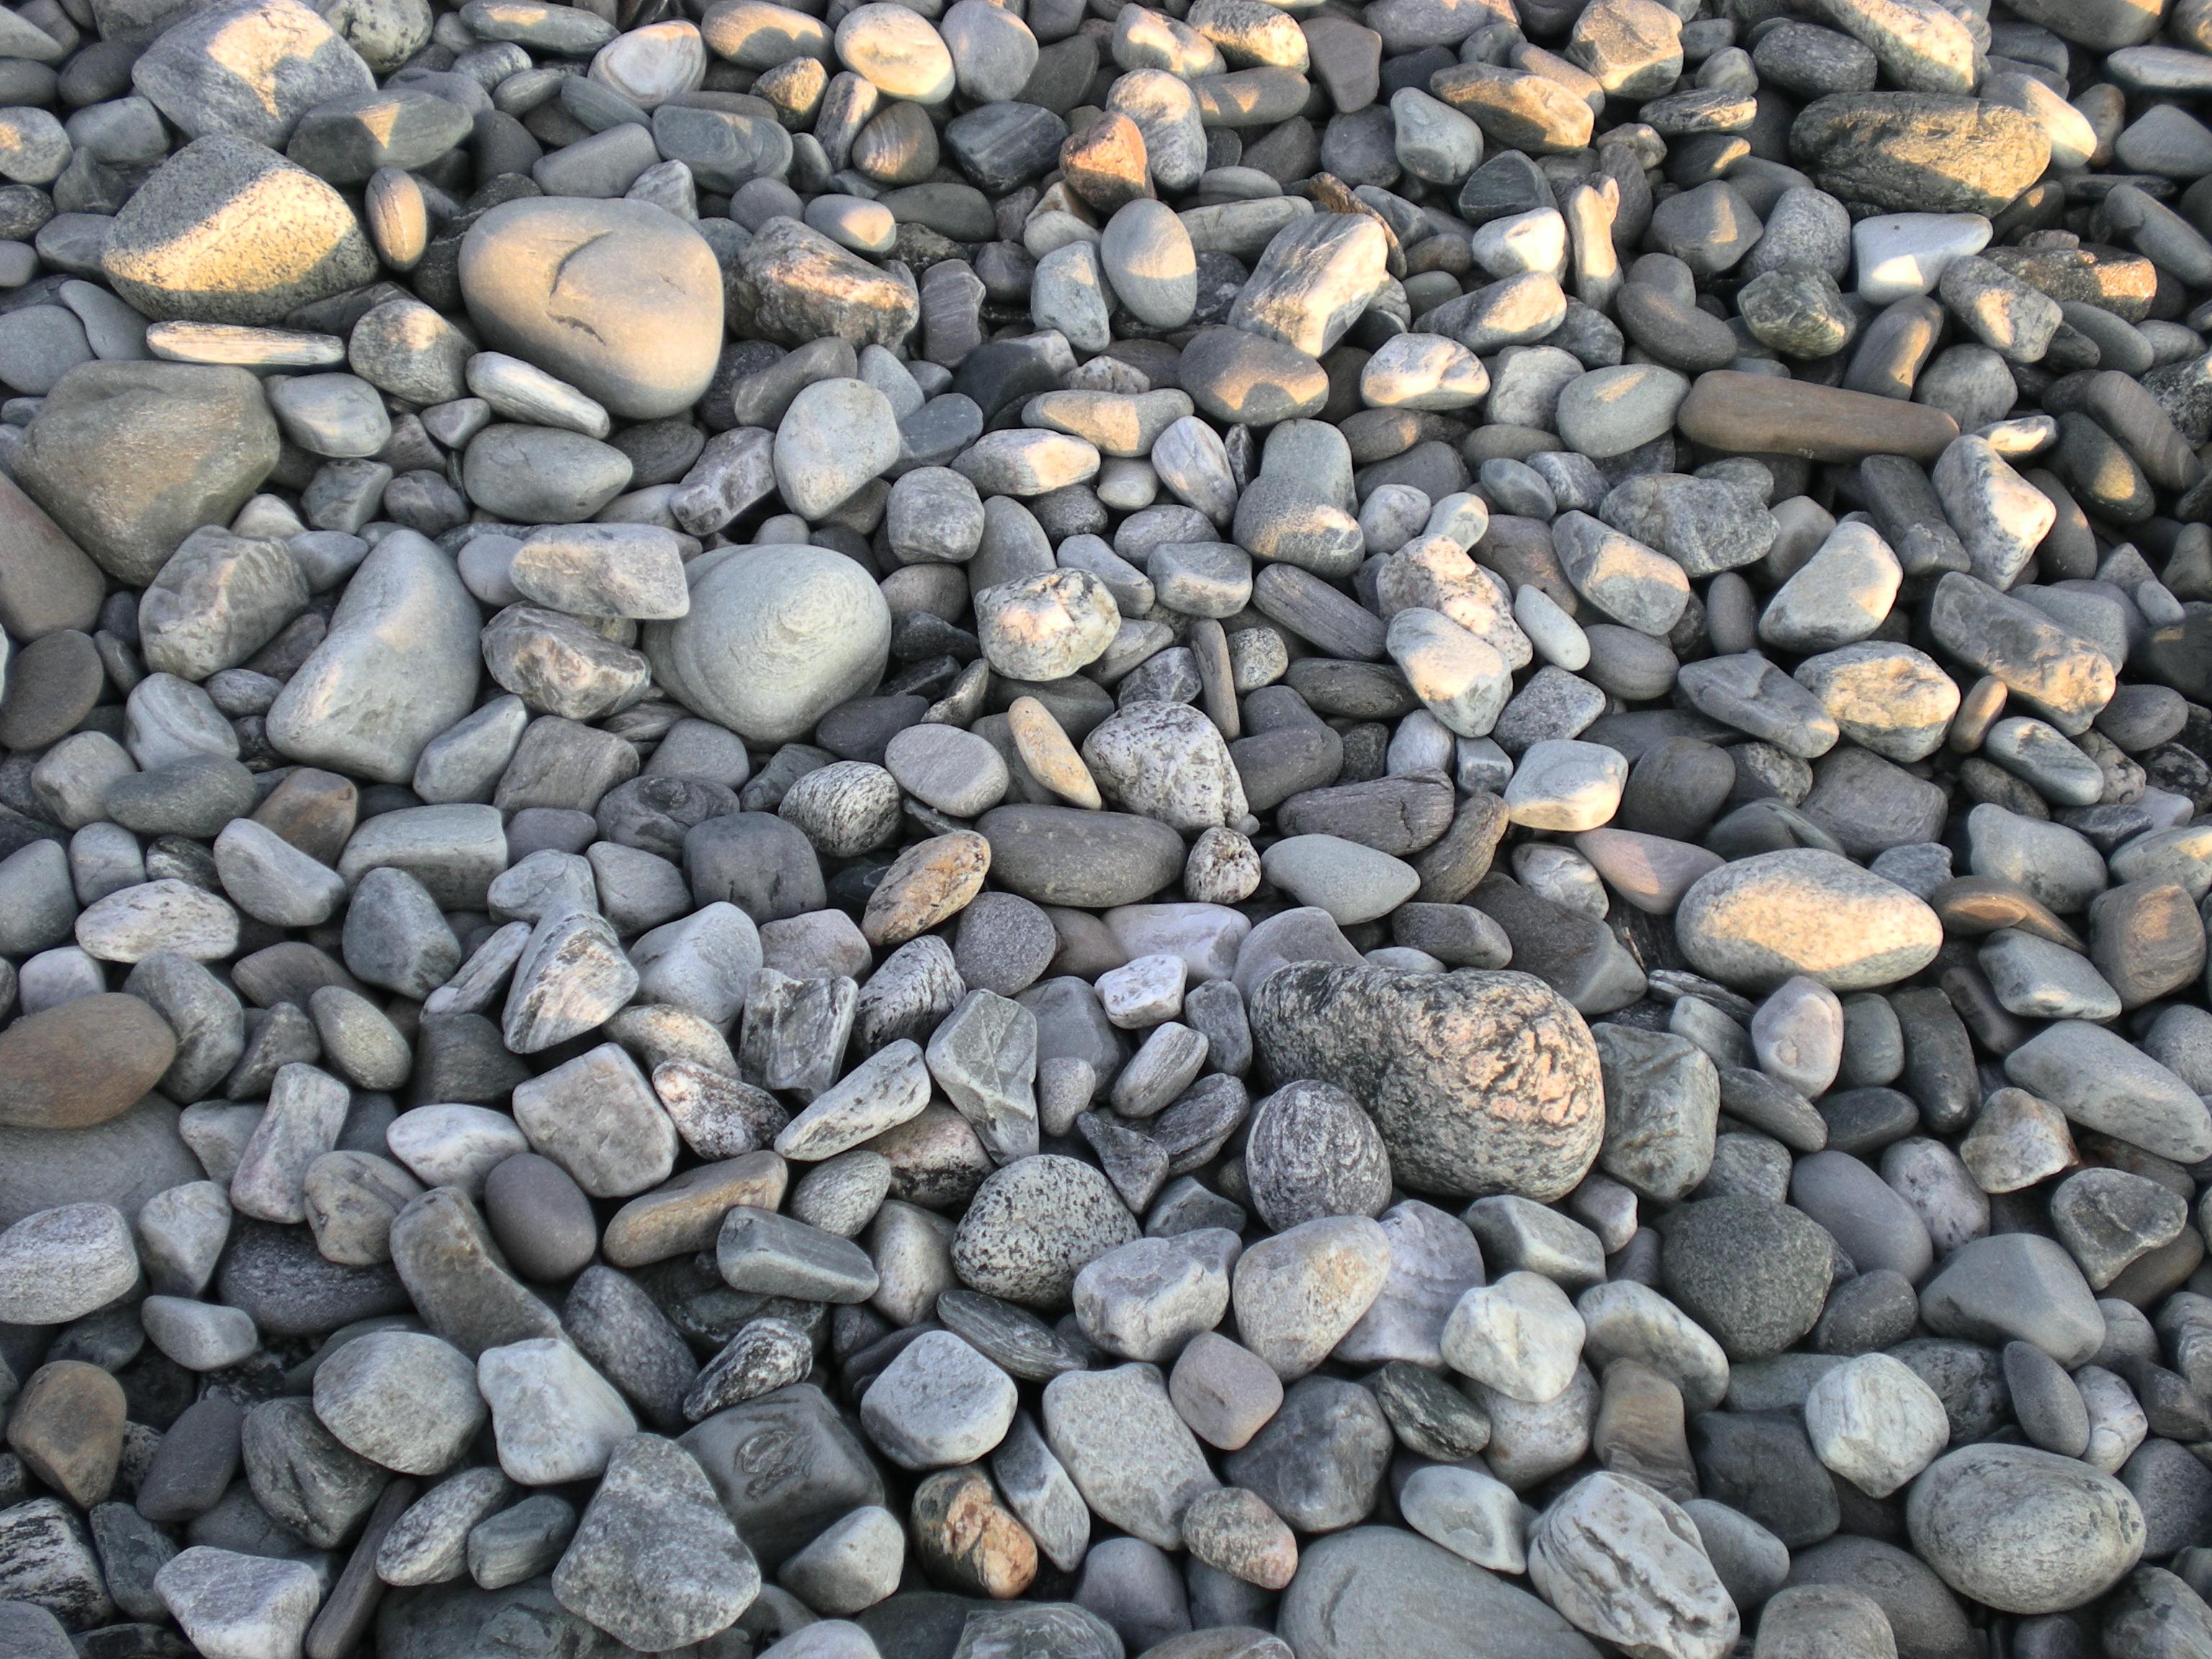 Description Coastal-rocks.jpg Rocks